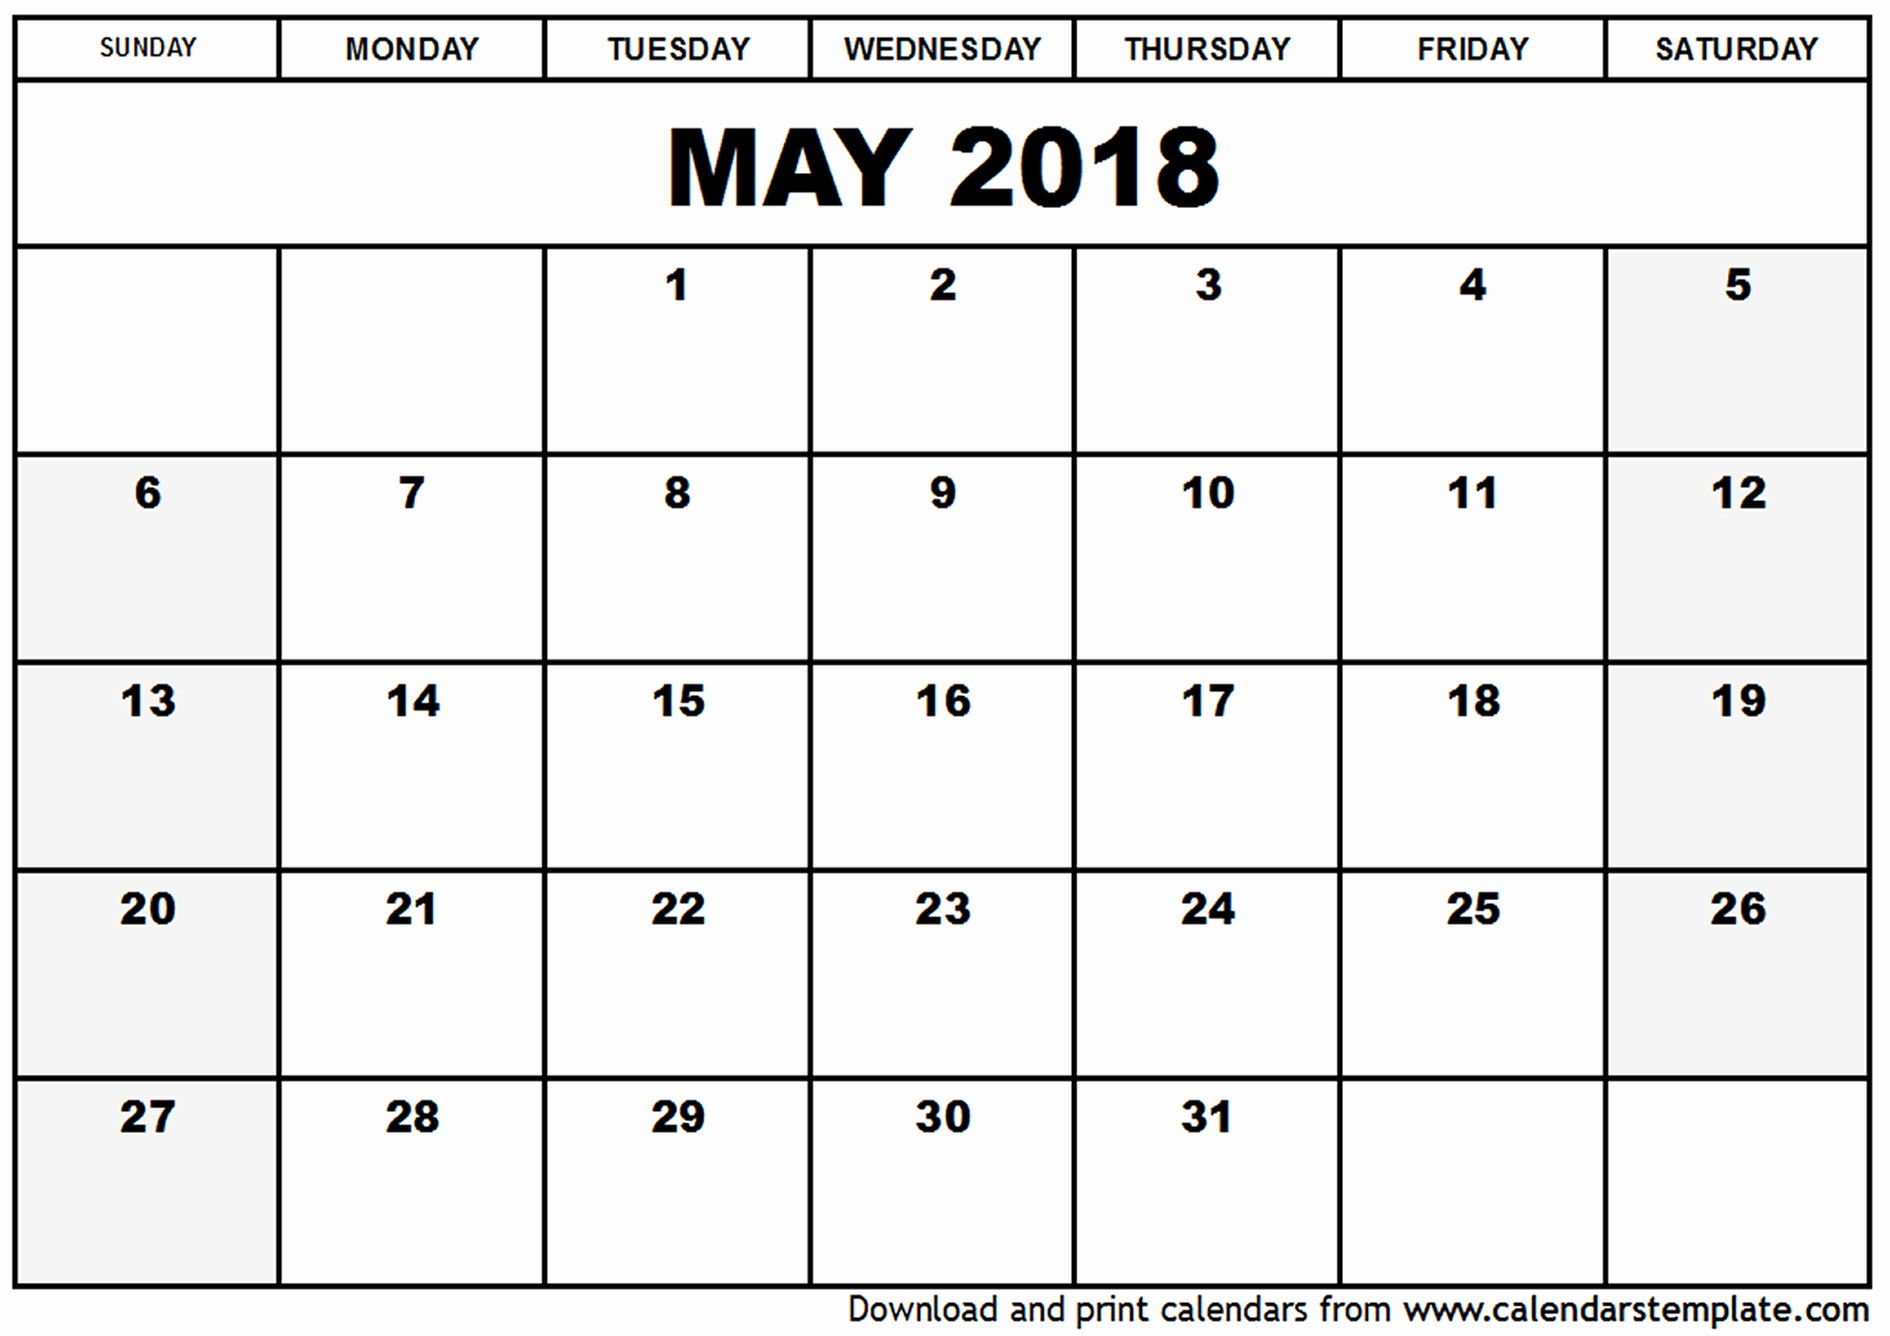 may 2018 calendar word 1837